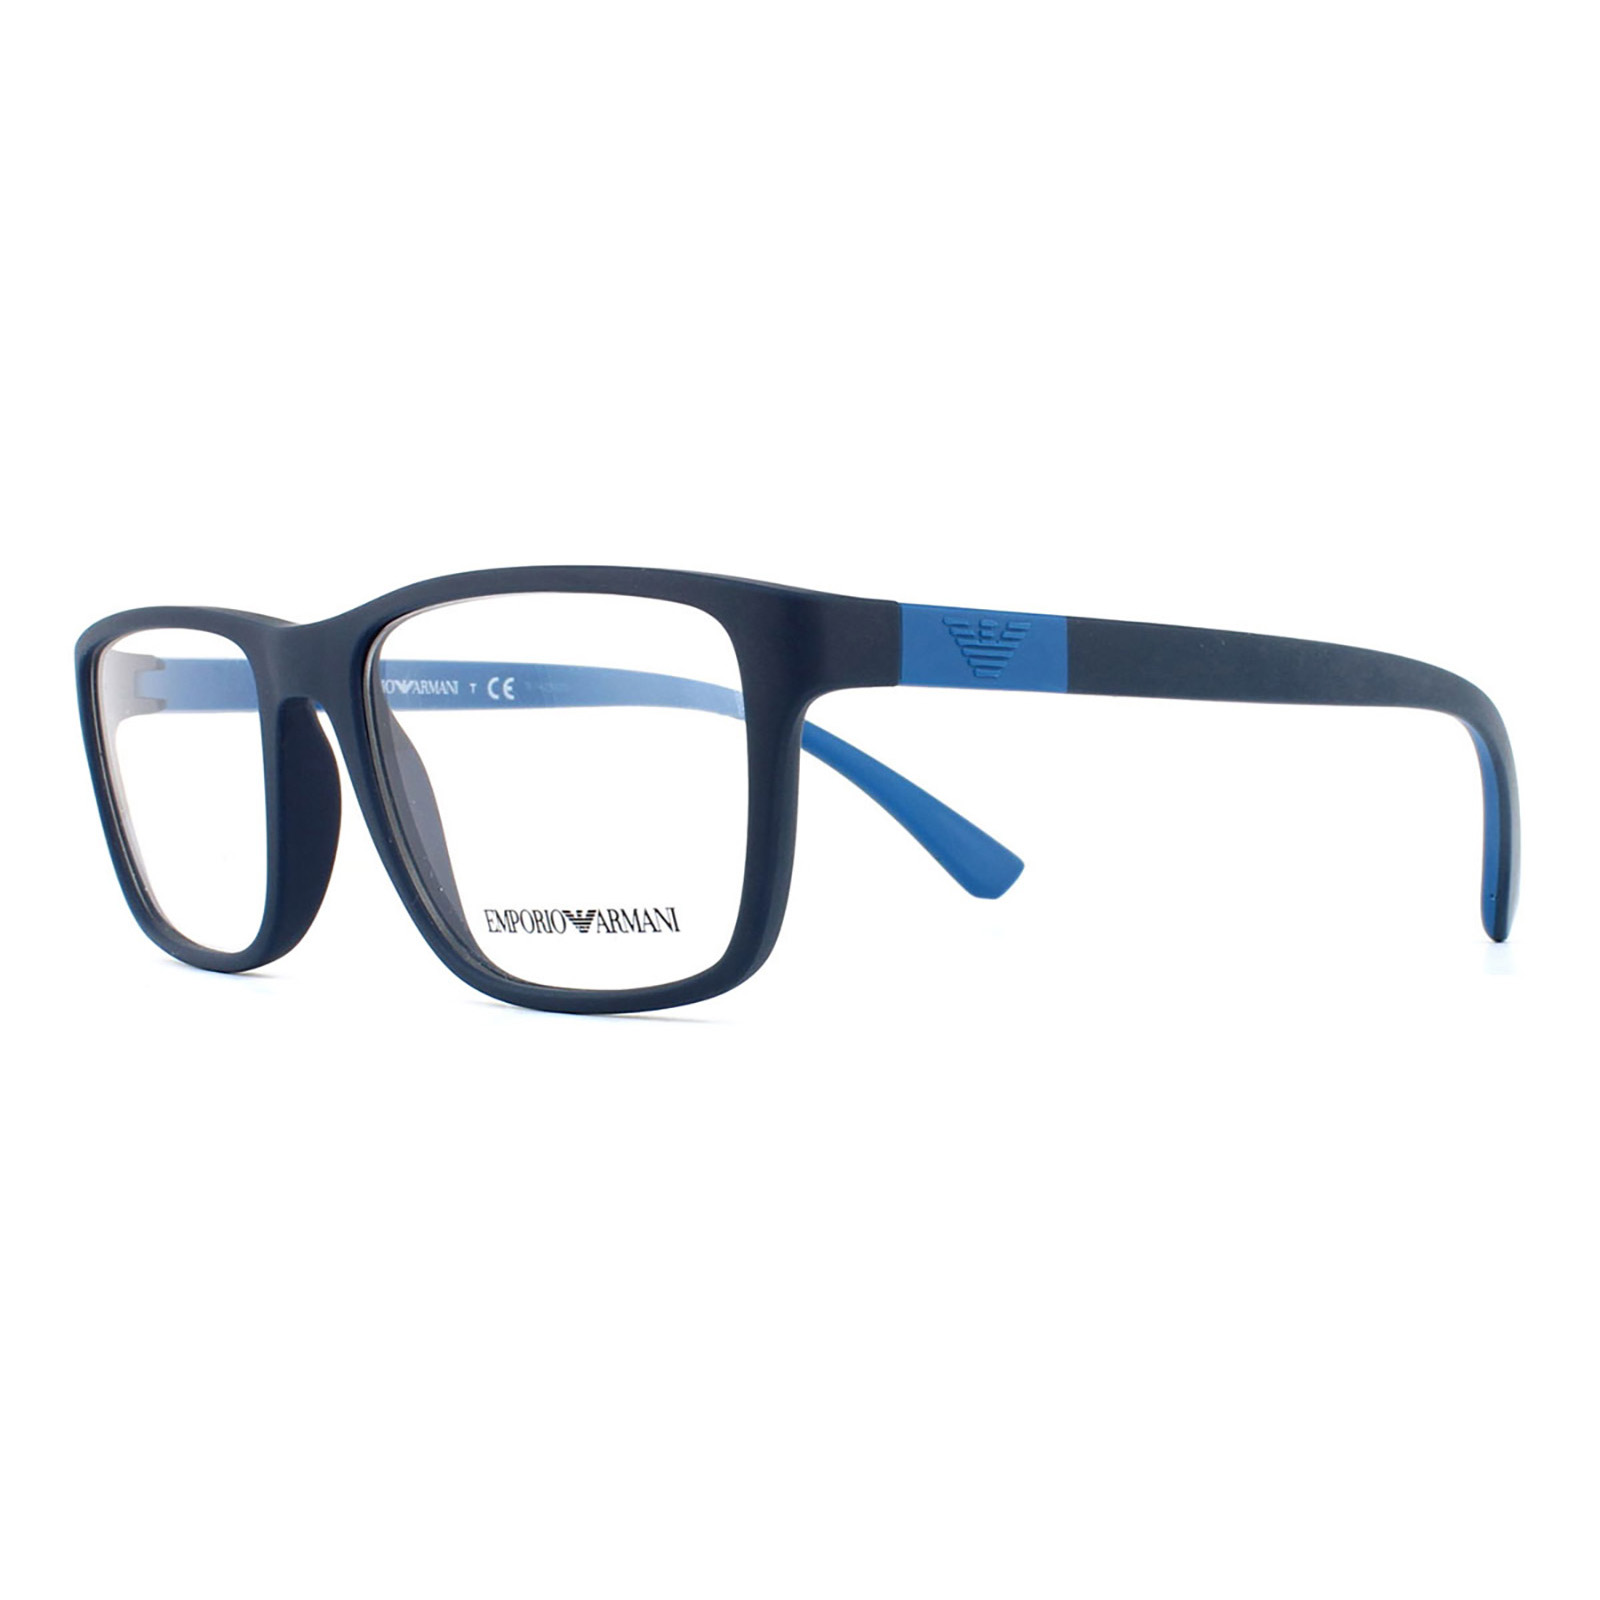 3df39dd9959f Emporio Armani Eyeglass Frames Repair Parts